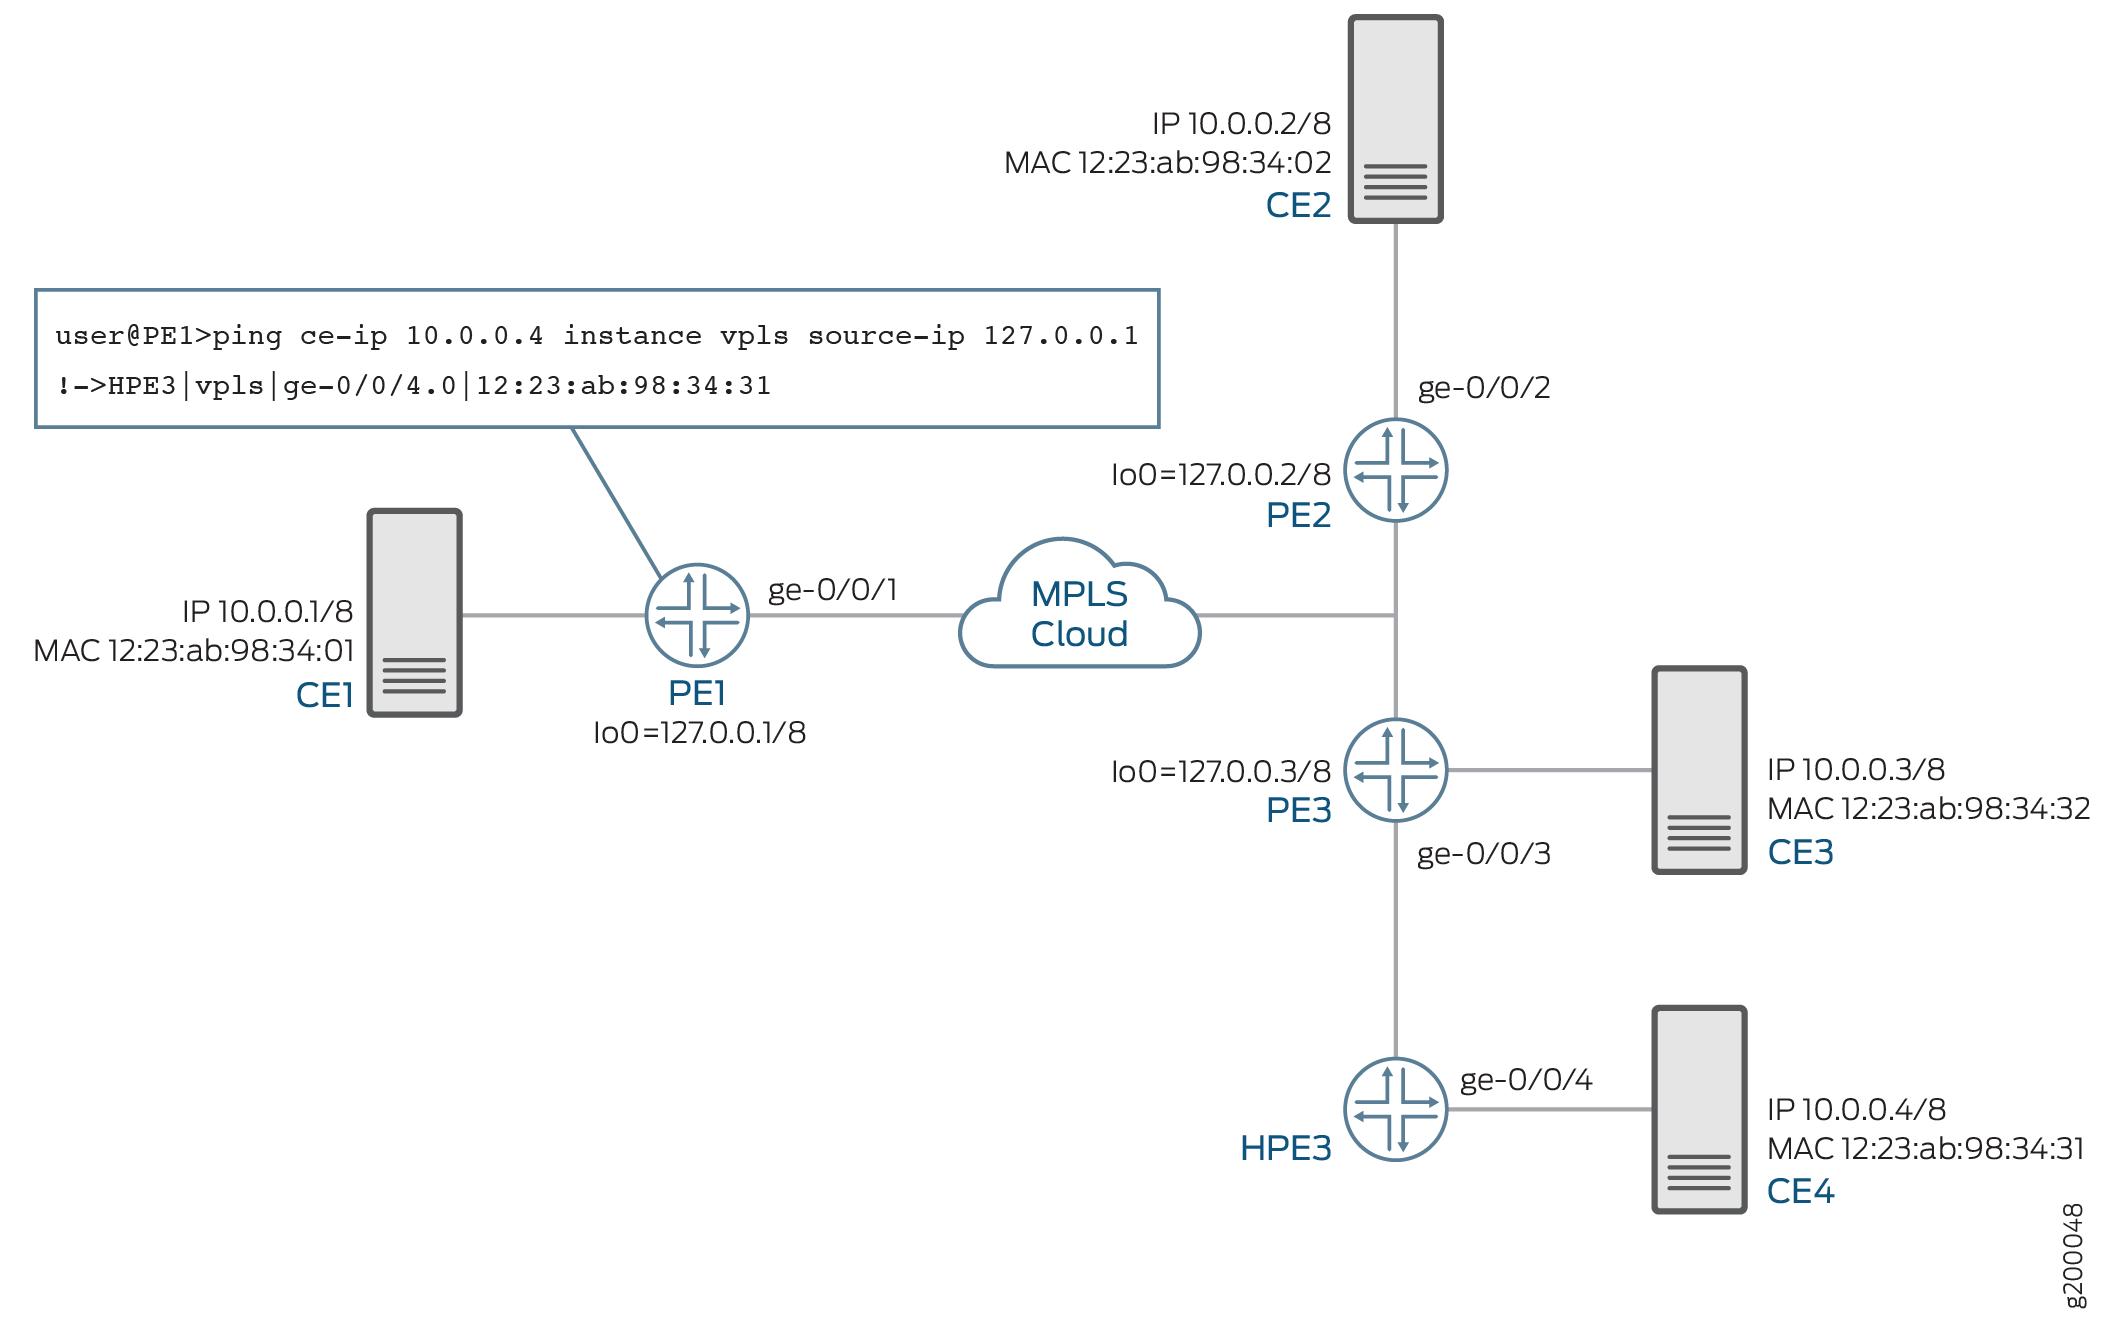 Pinging Customer Edge Device IP Address - TechLibrary